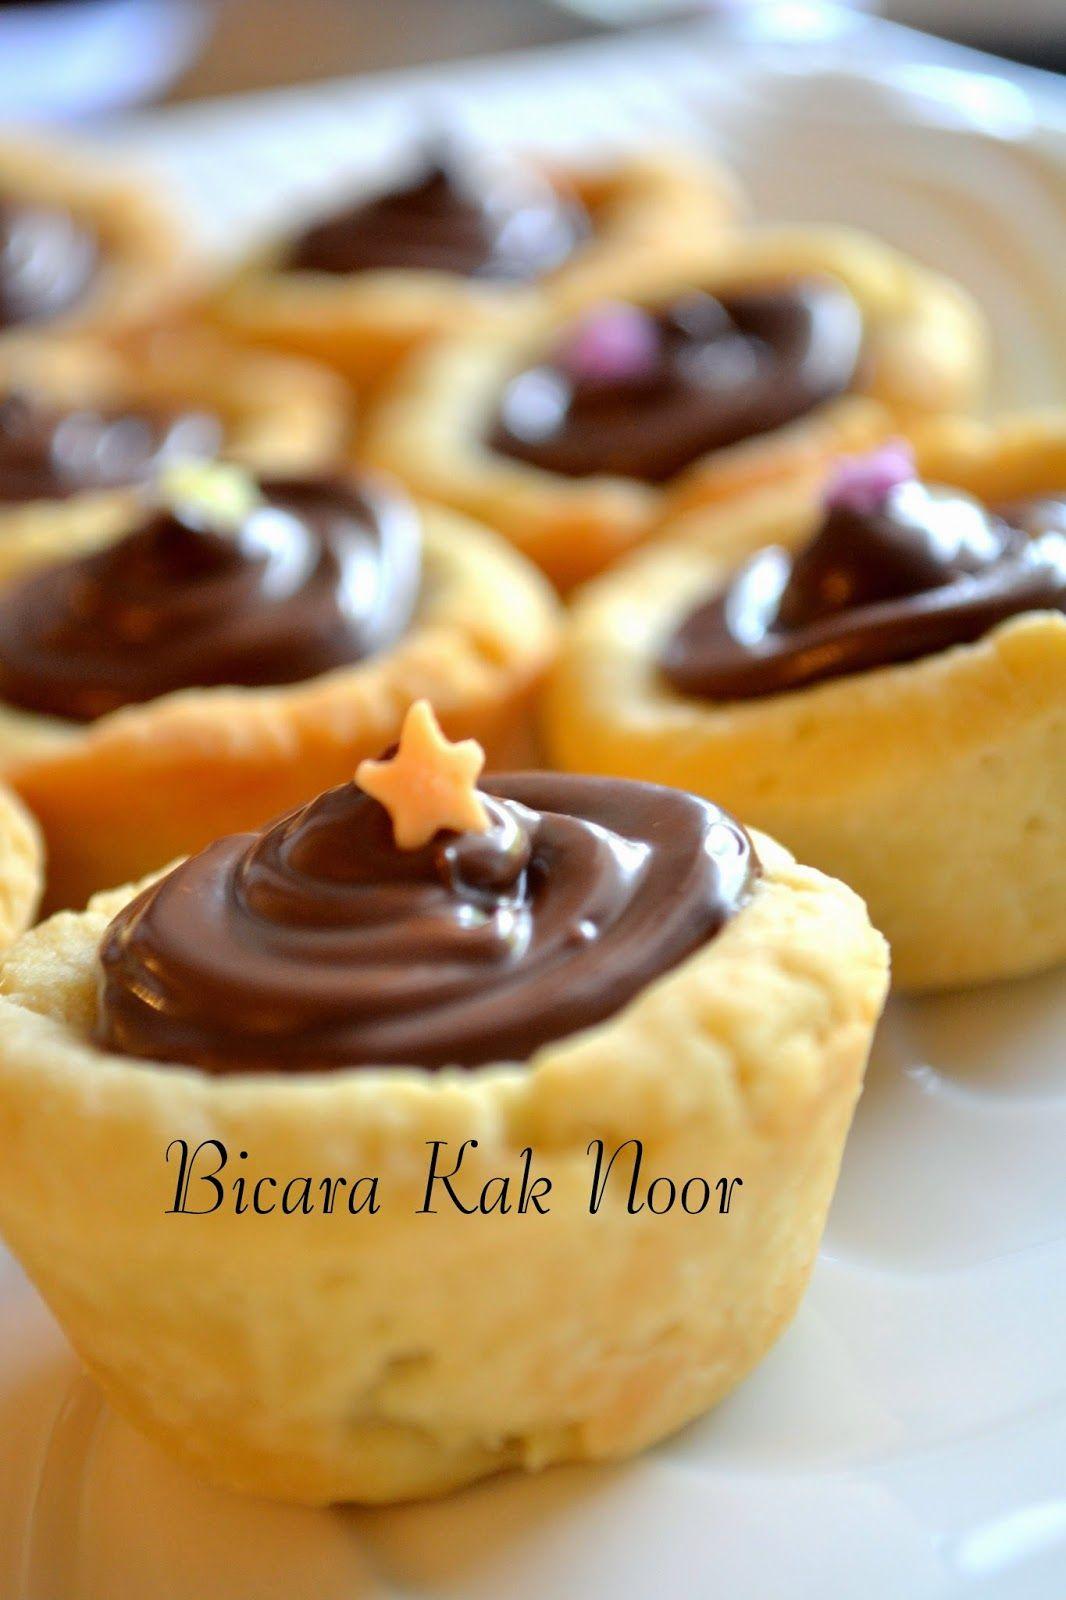 Nutella Tart Yang Sangat Sedap Resepi Pinterest Lagiii Bicara Kak Noor Nutella Mini Cakes Cake Recipes